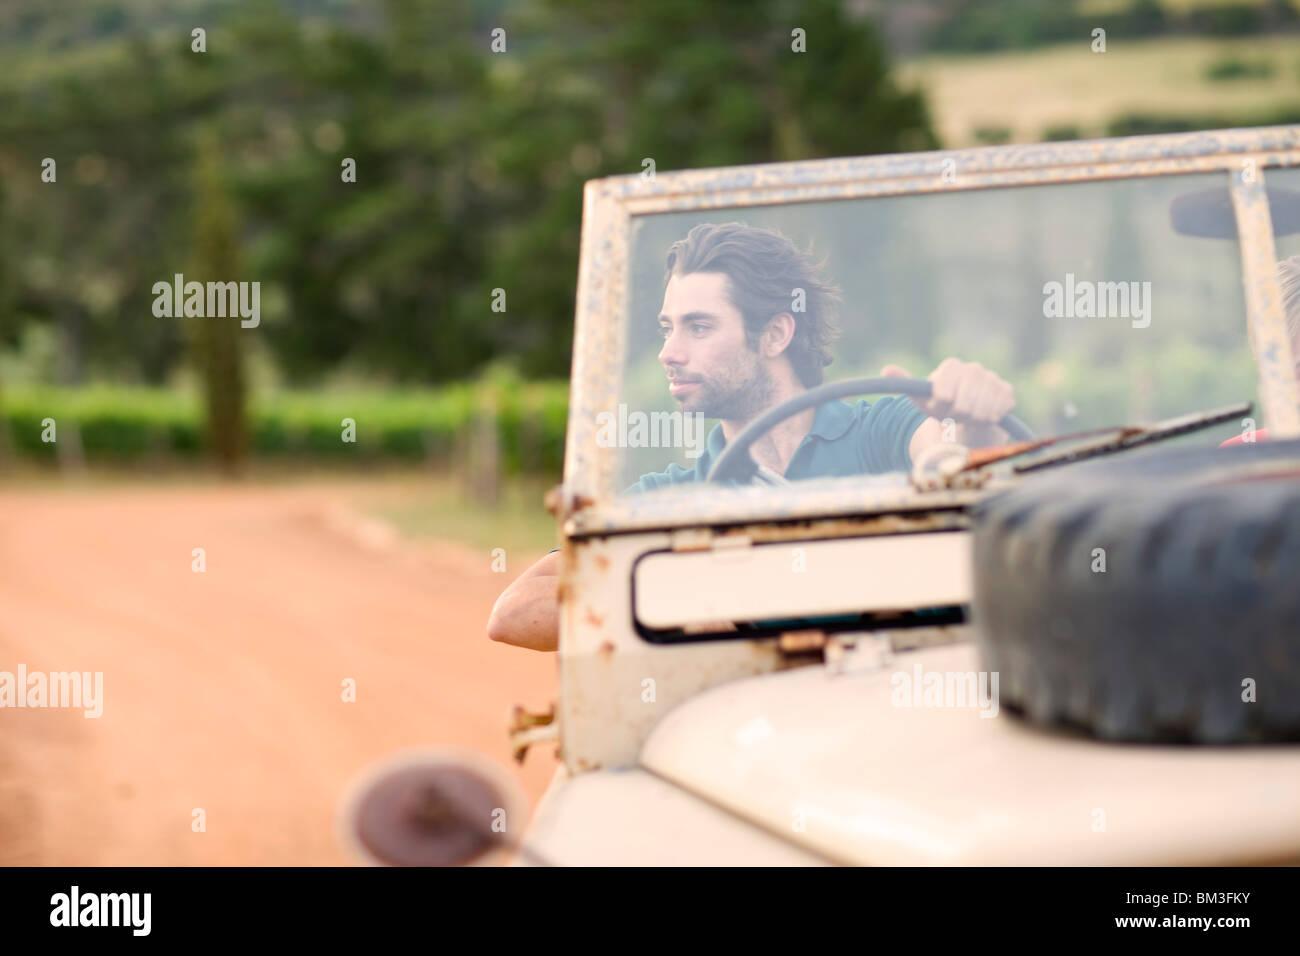 Mann in einem Off-Road-Fahrzeug Stockbild